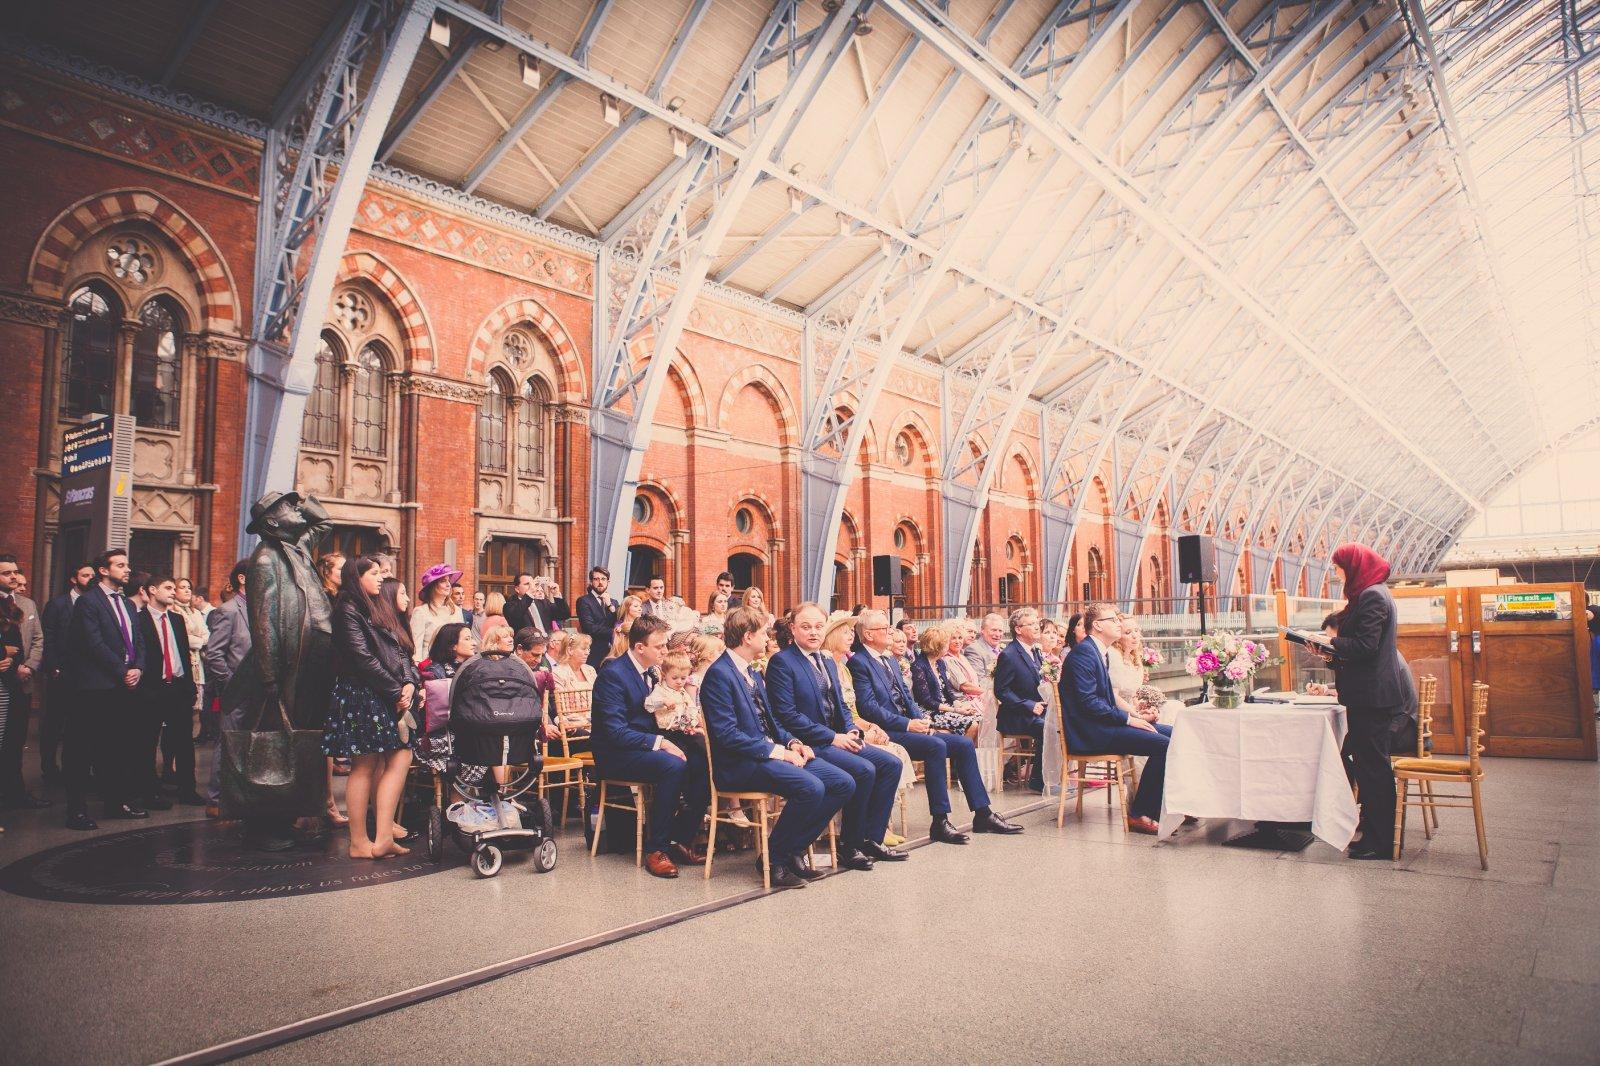 St Pancras Searcys Wedding Venue Alternative London Late